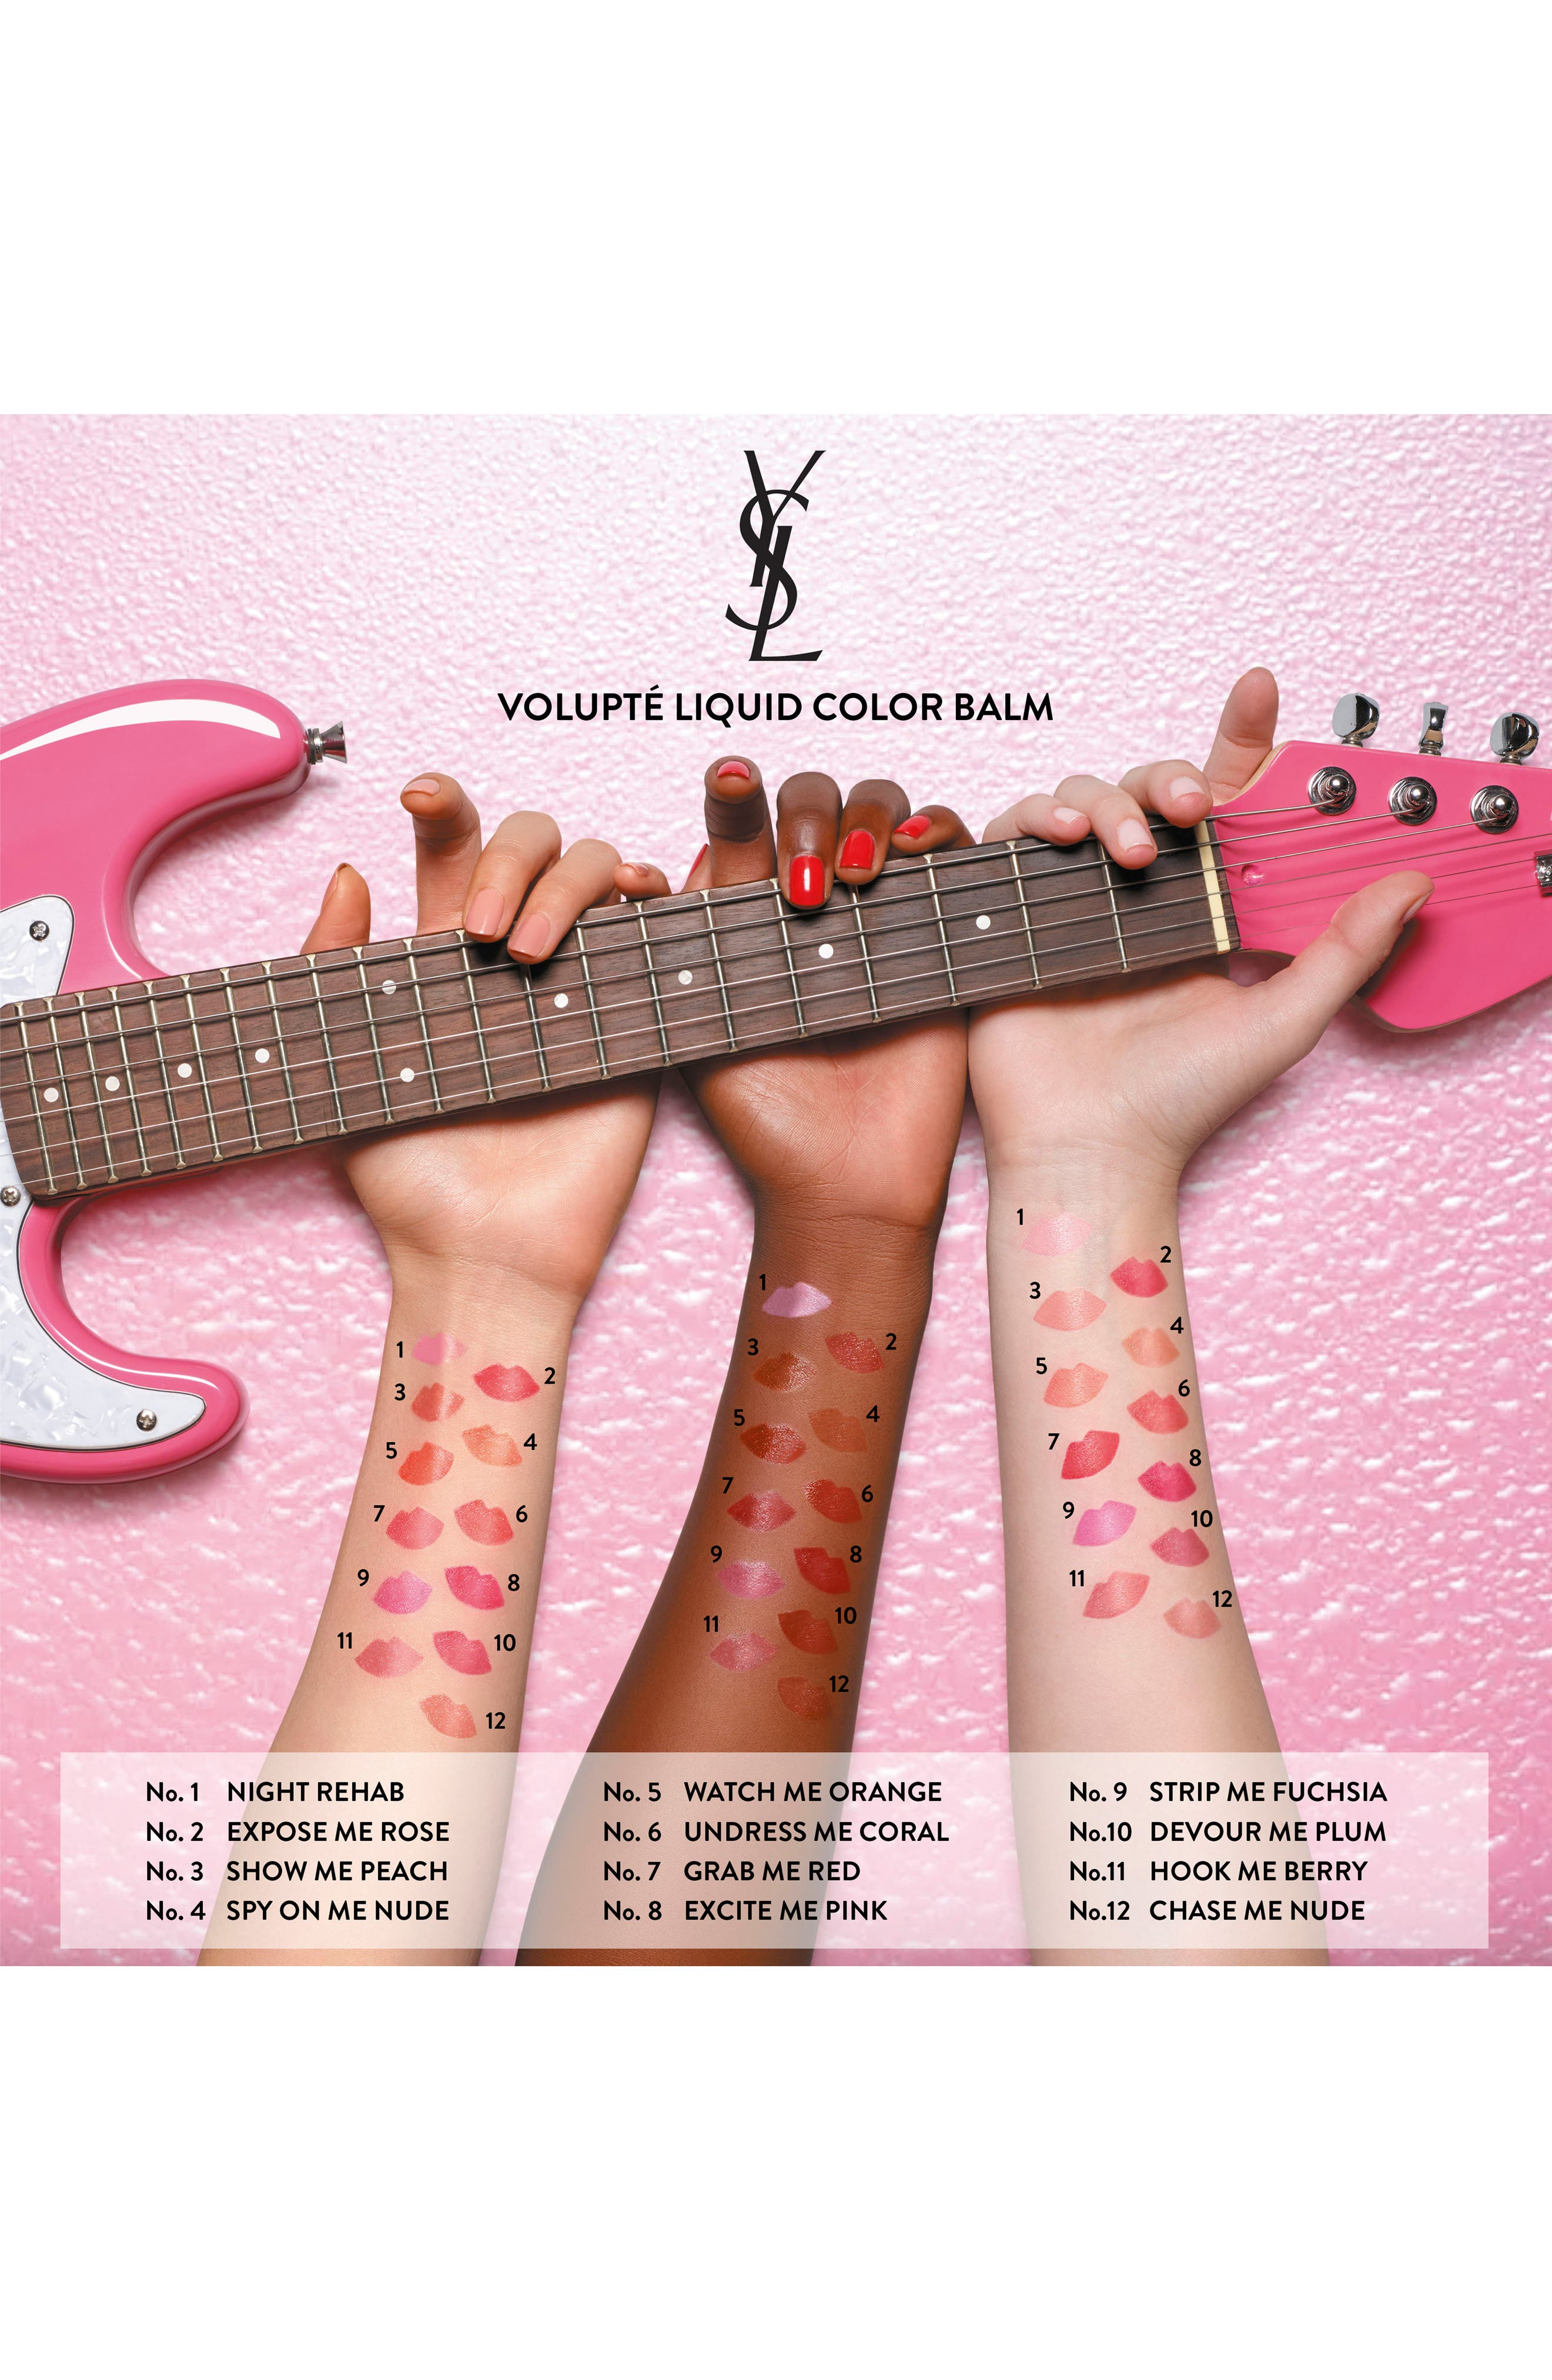 YVES SAINT LAURENT, Volupté Liquid Balm, Alternate thumbnail 3, color, 04 SPY ON ME NUDE